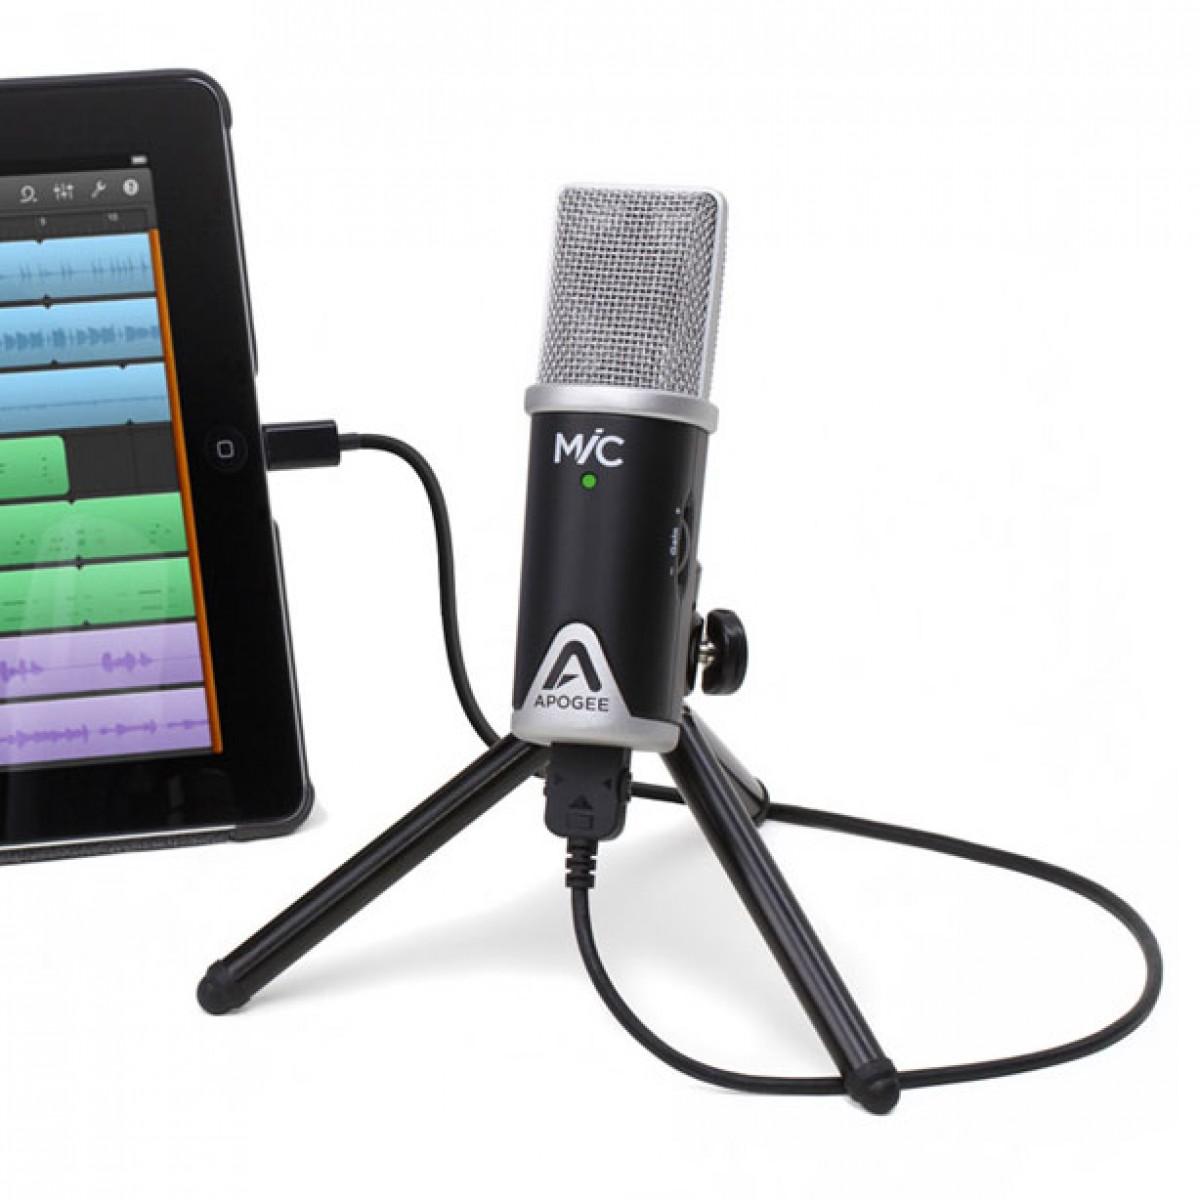 iPhone ve iPad Mikrofonu: Apogee Mic 96K İnceleme